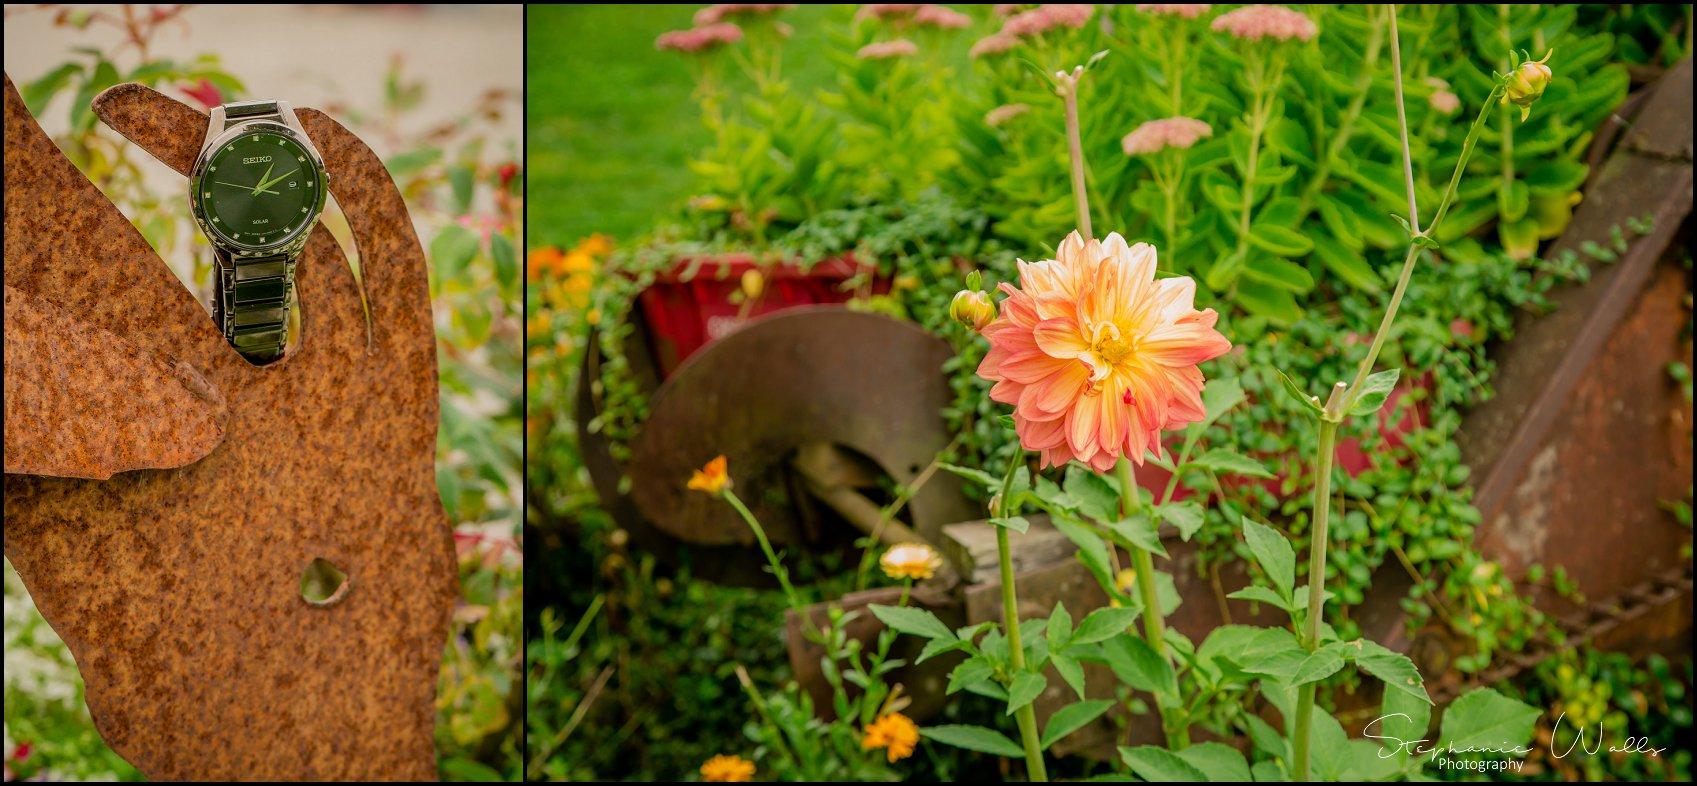 Kimble Wedding 087 Marlena & Allans | Snohomish Red Barn Events (Stocker Farms) | Snohomish, Wa Wedding Photographer